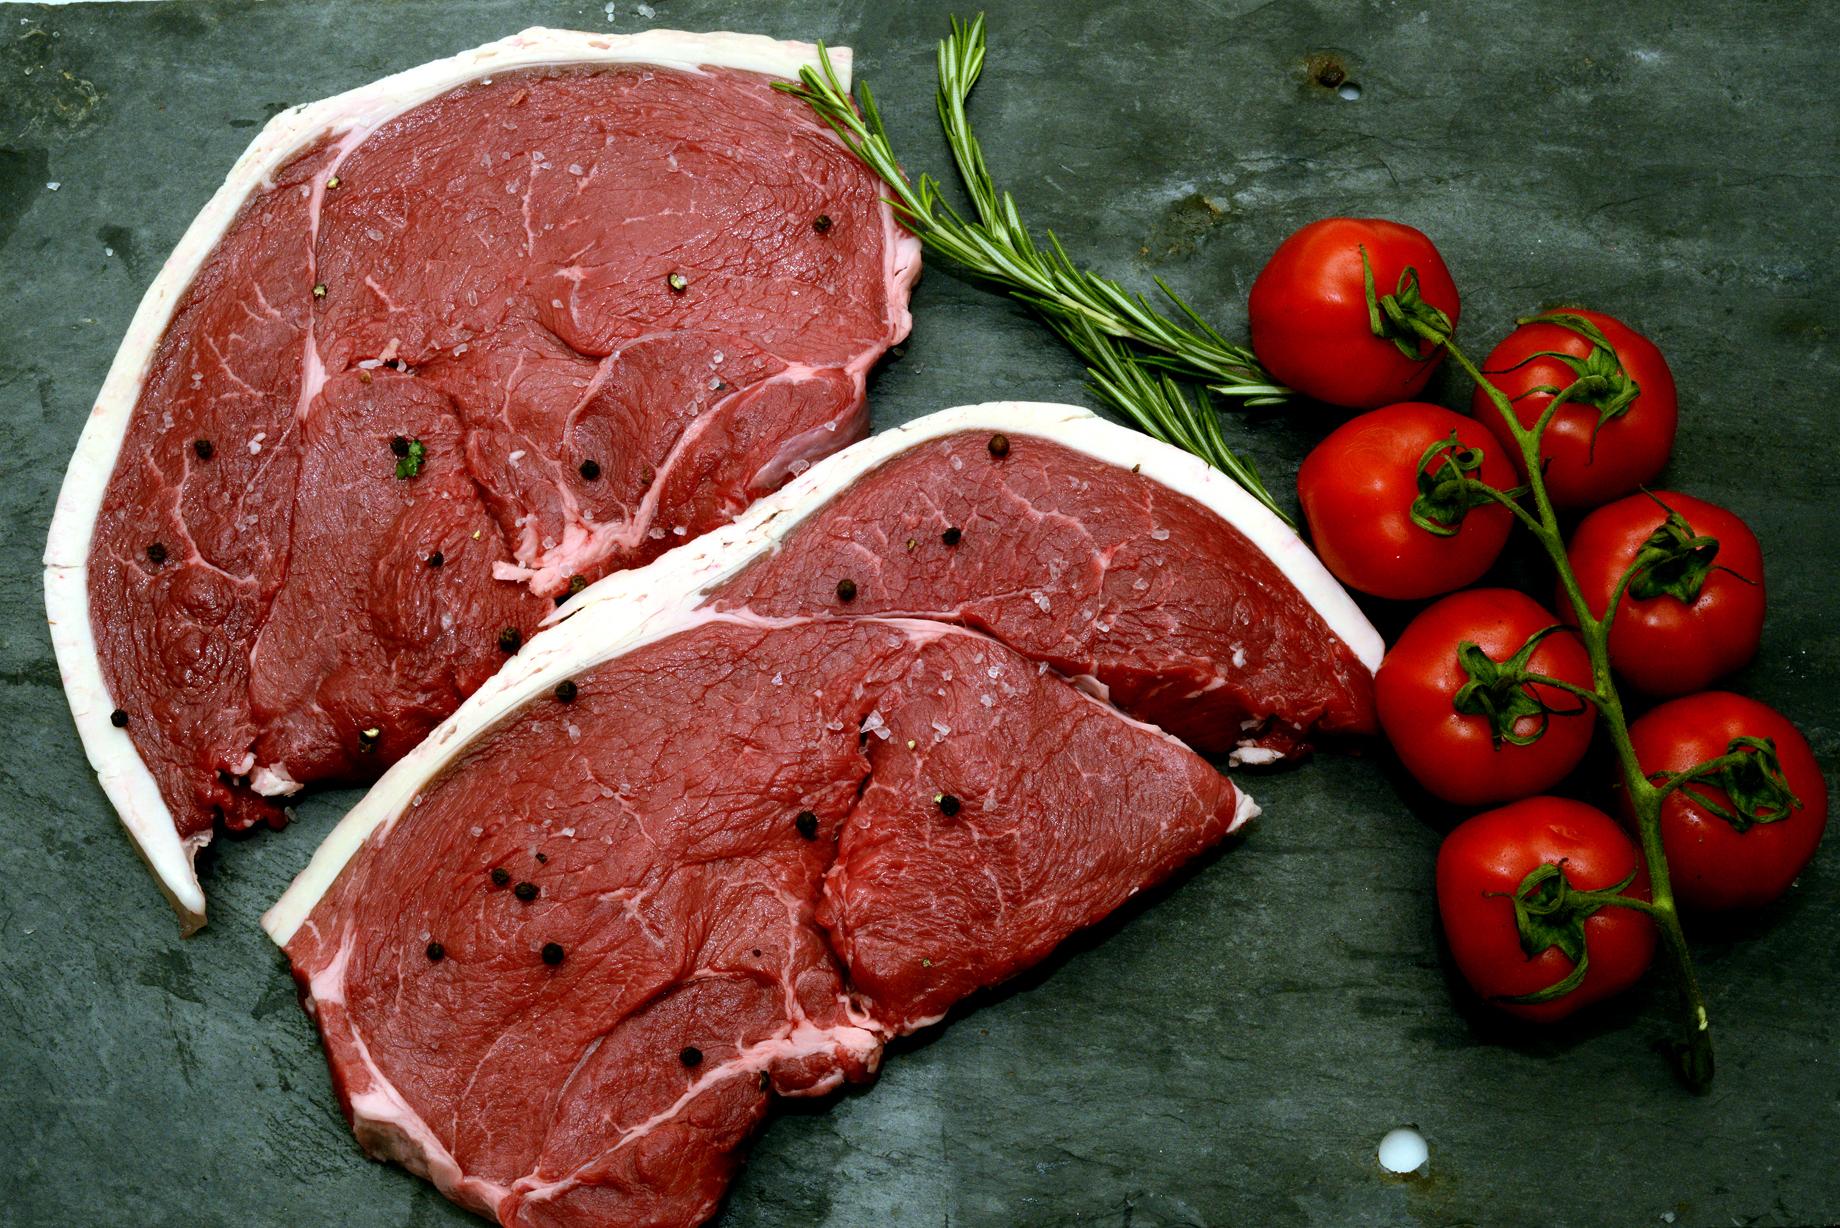 Brights farm beef